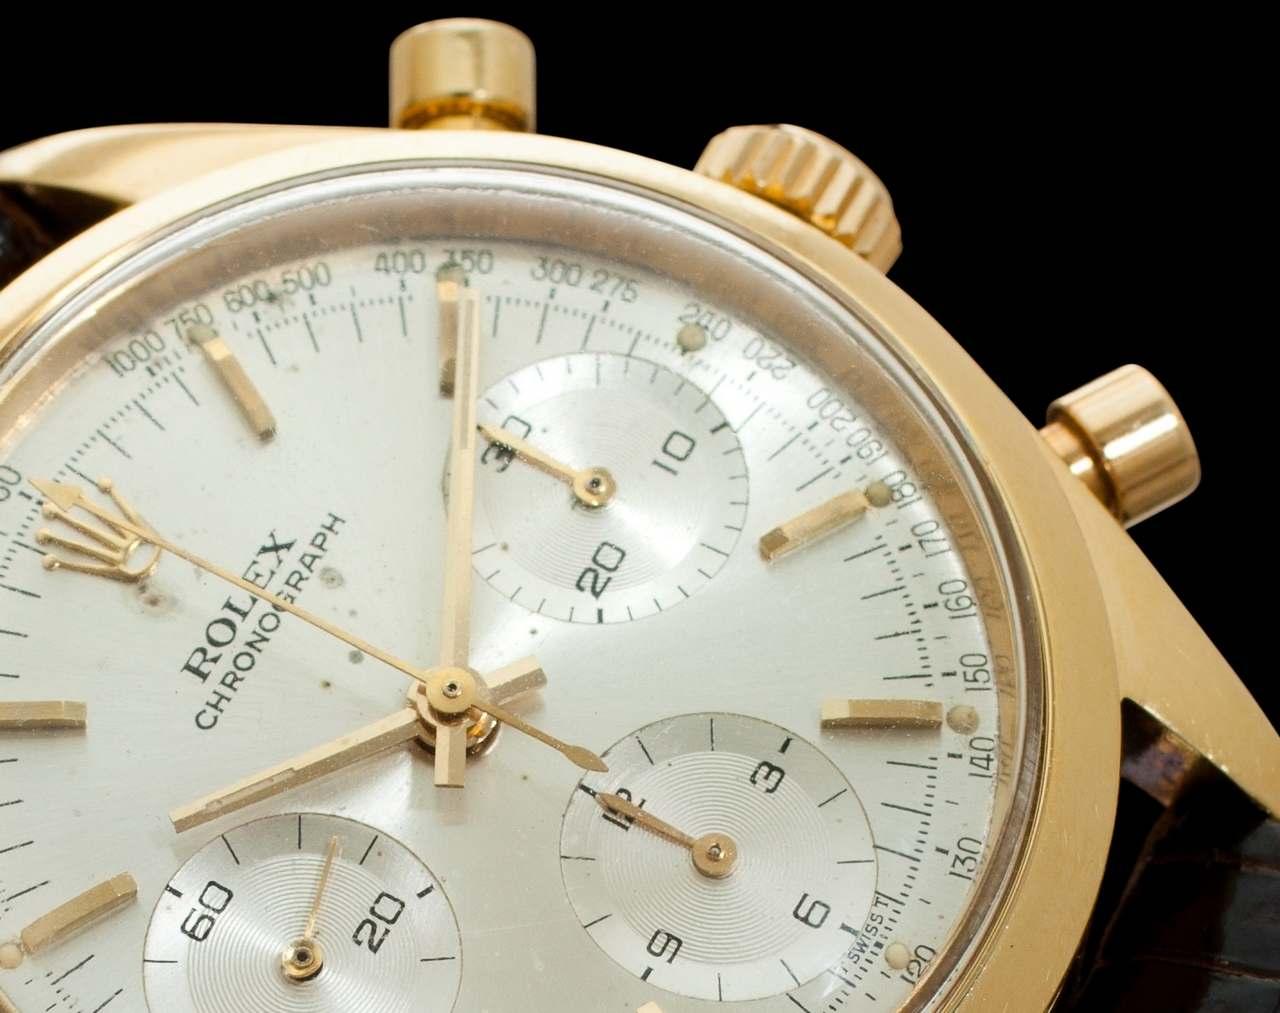 Rolex_Pre_Daytona_Ref_ 6238_Case No.996925_prezzo_price_source_bonhams2